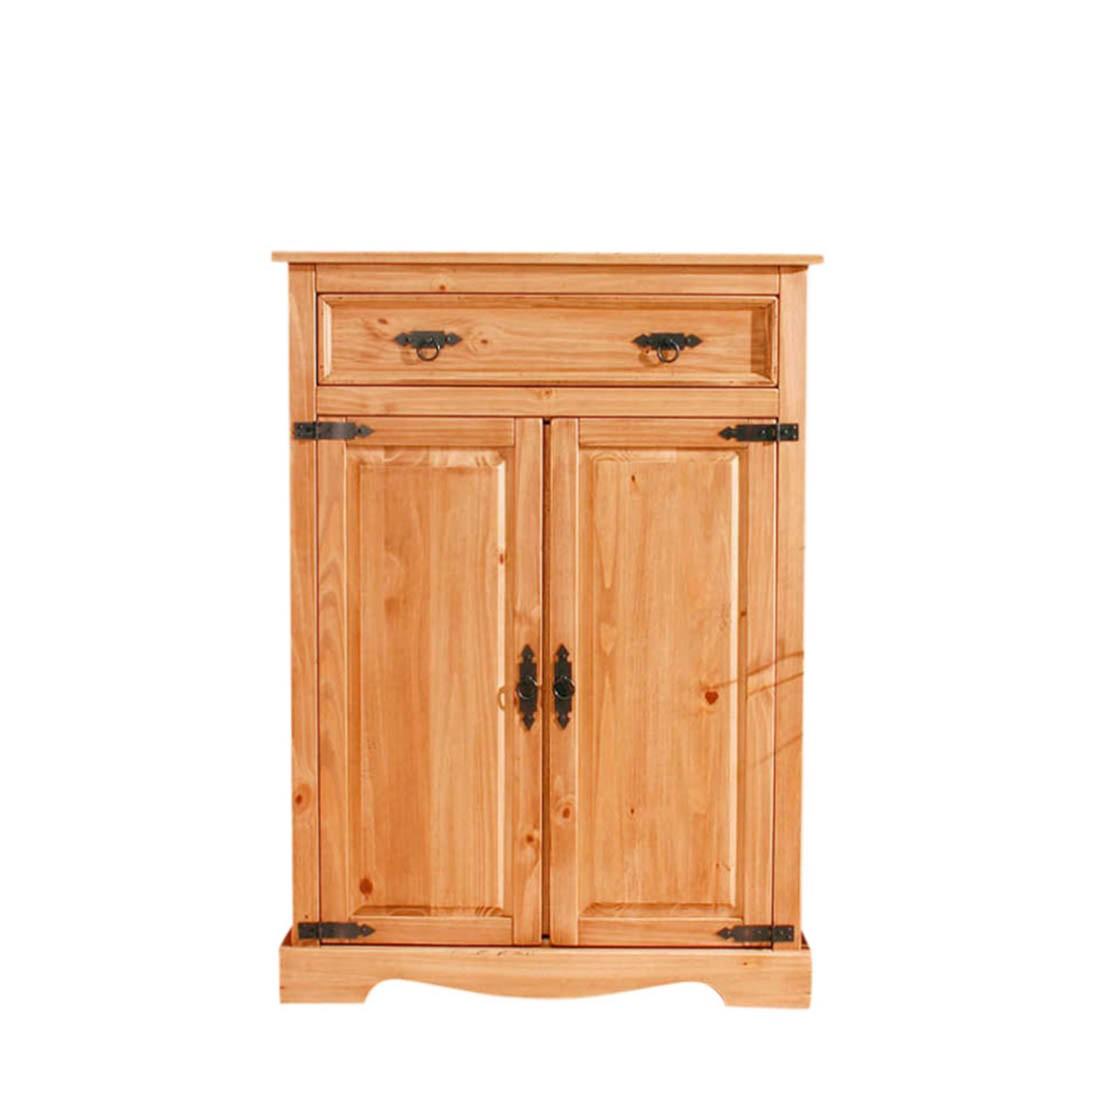 Vertiko Jowita - Legno massello di pino, Maison Belfort